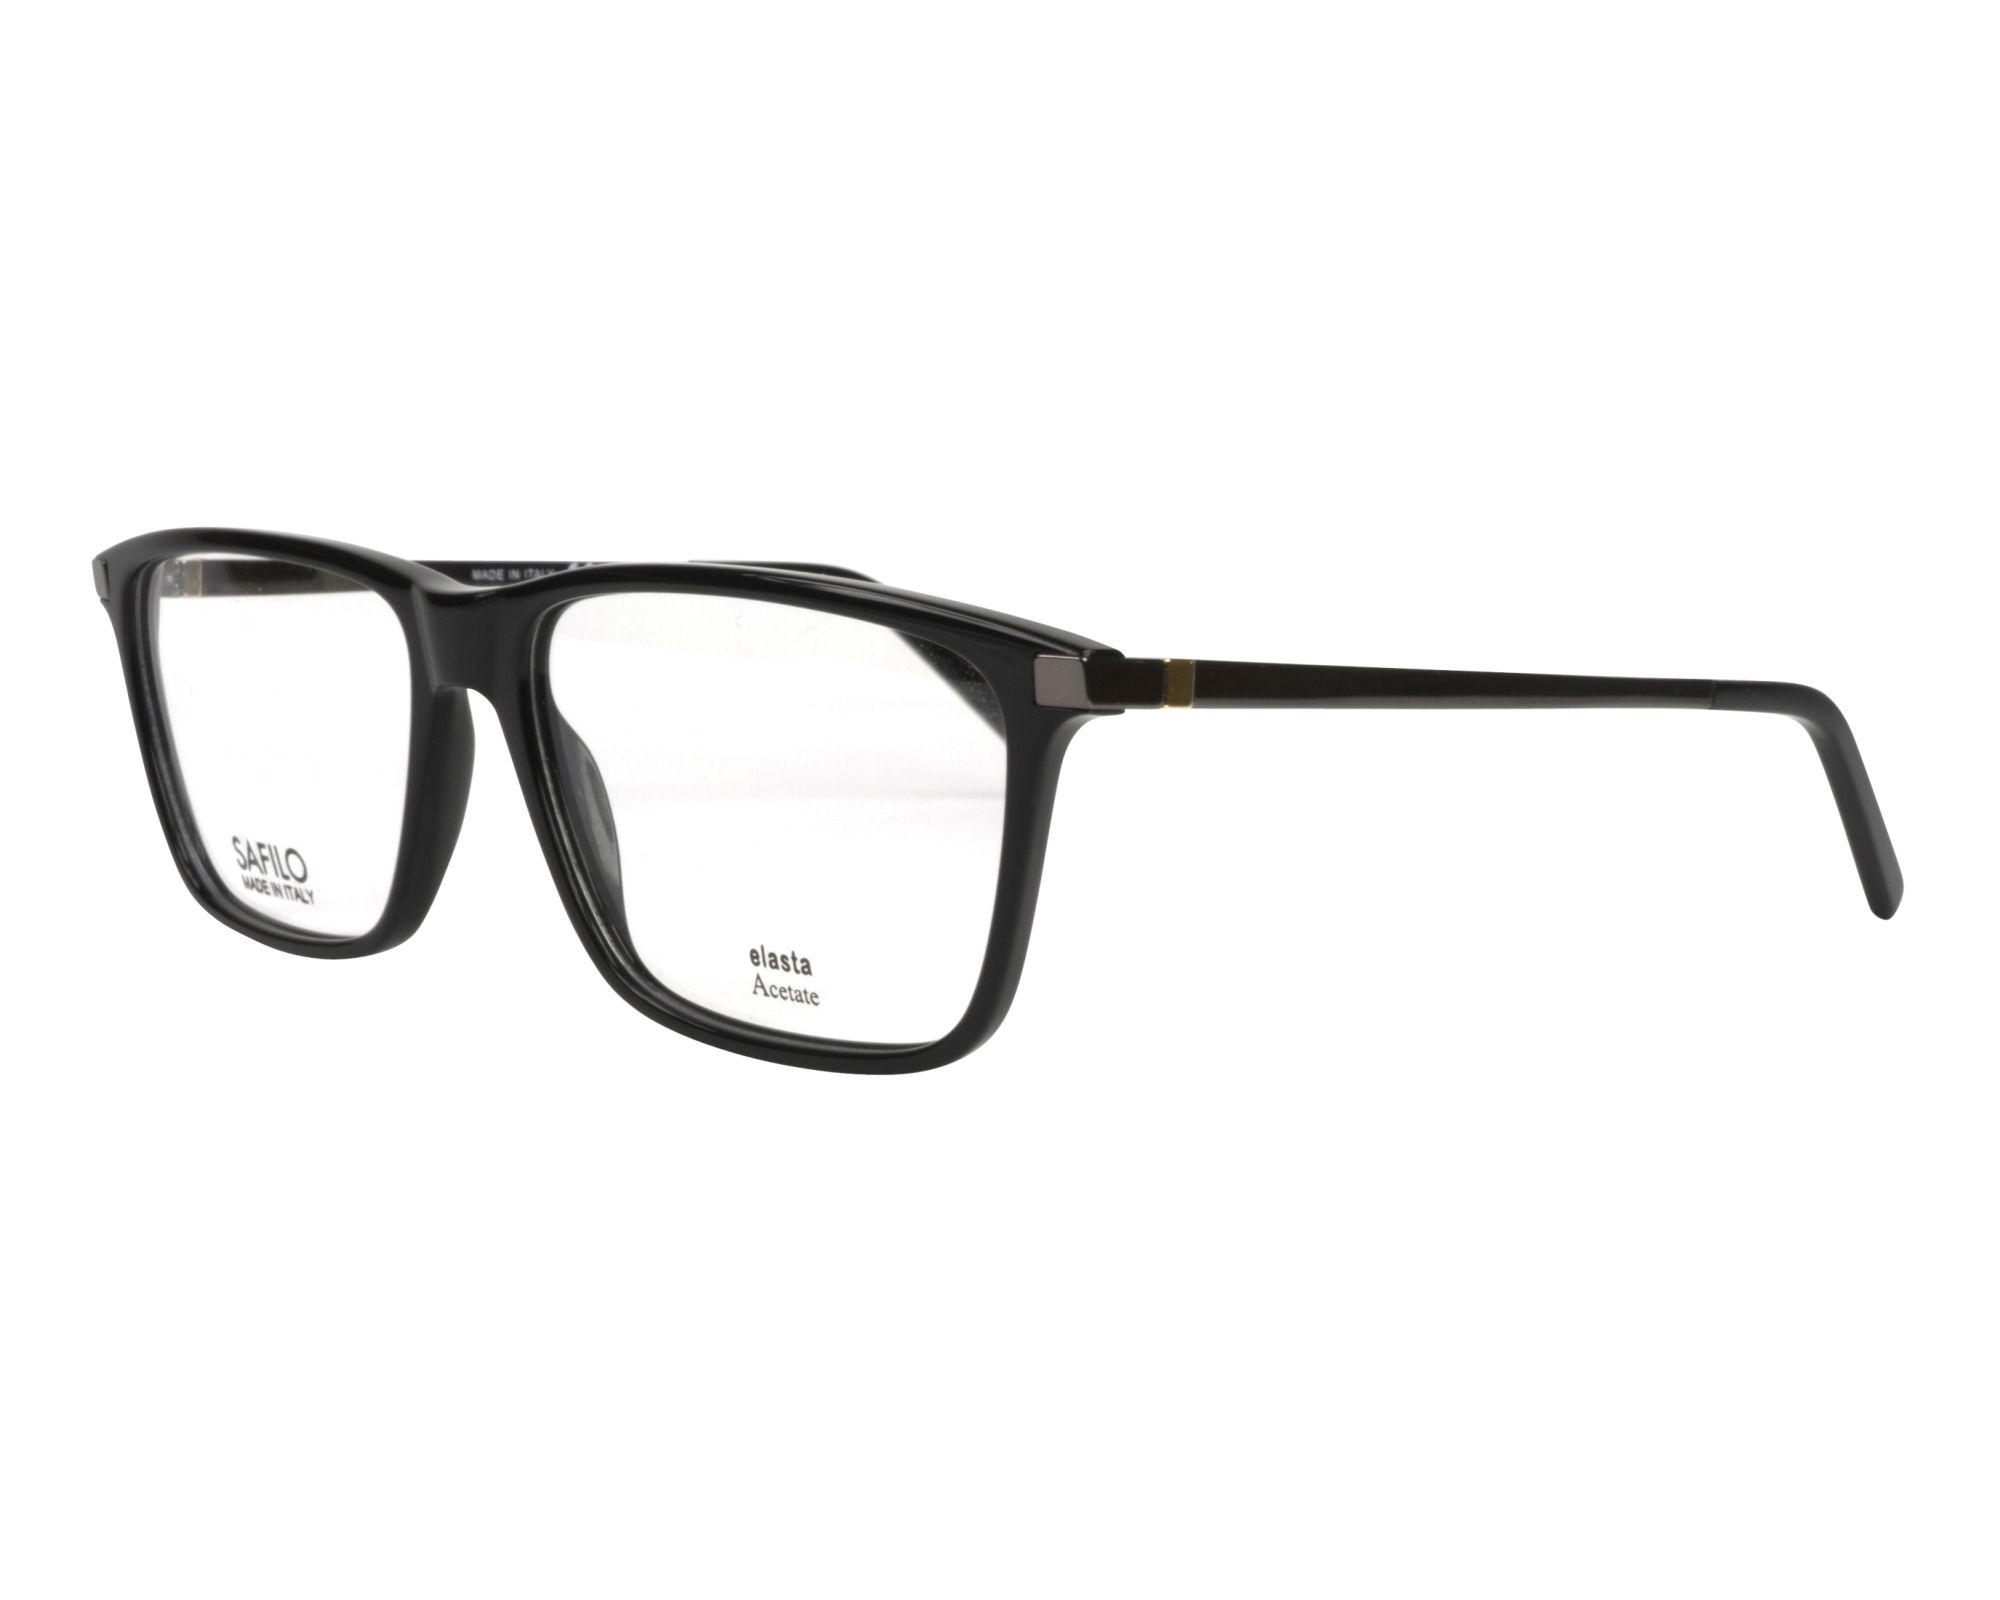 Safilo Eyeglasses Black SA-1035 ANS - Visionet US